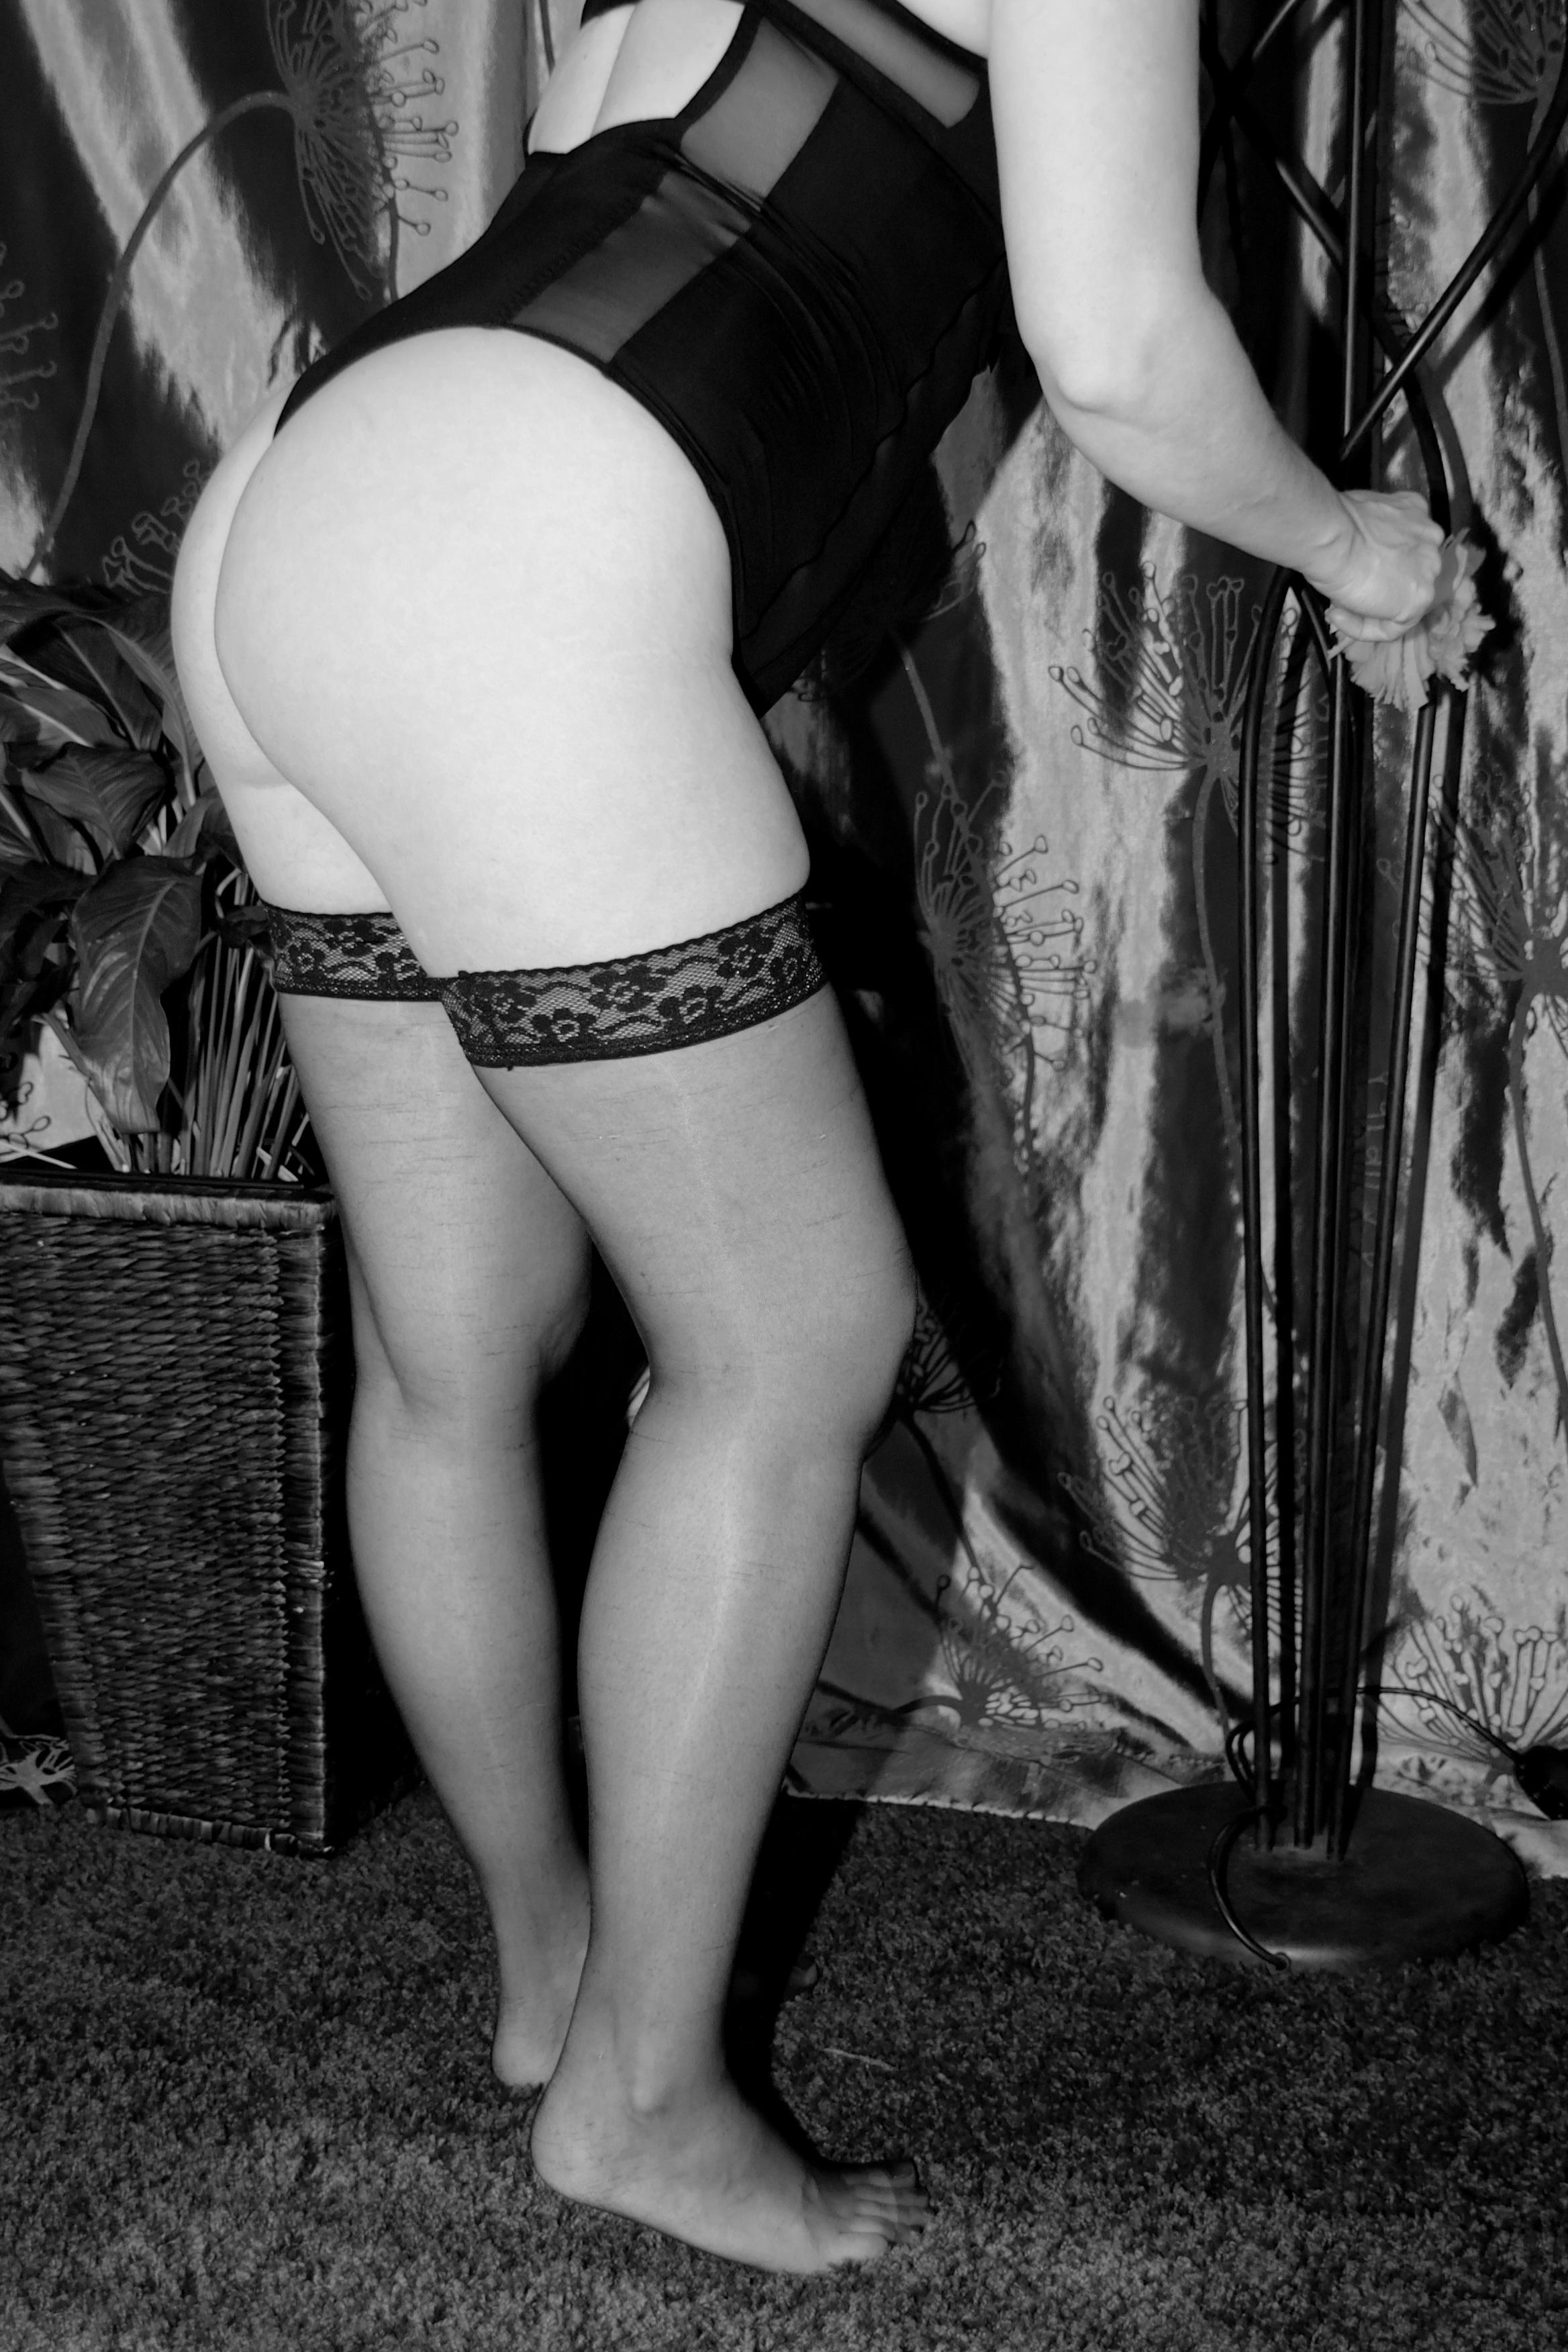 Nude women panties and stockings something